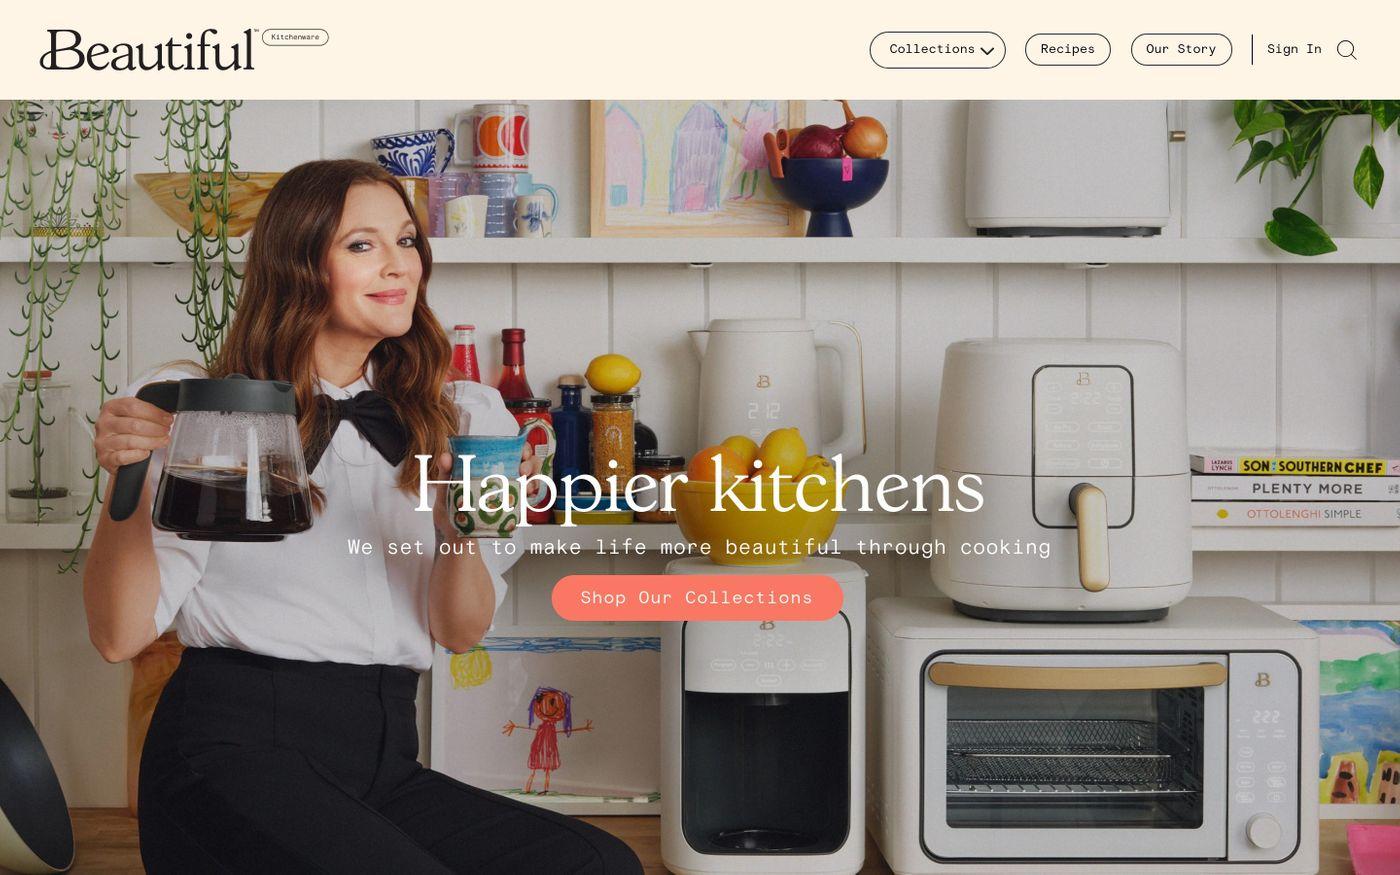 Screenshot of Beautiful website